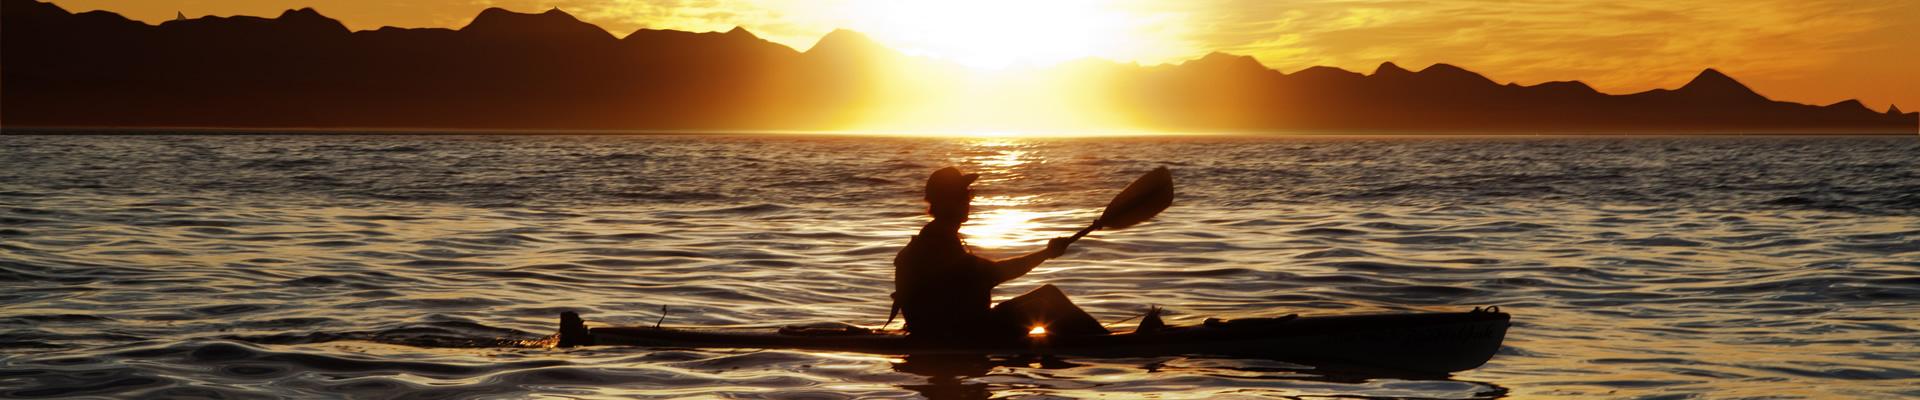 Special offers in Plett on adventure activities